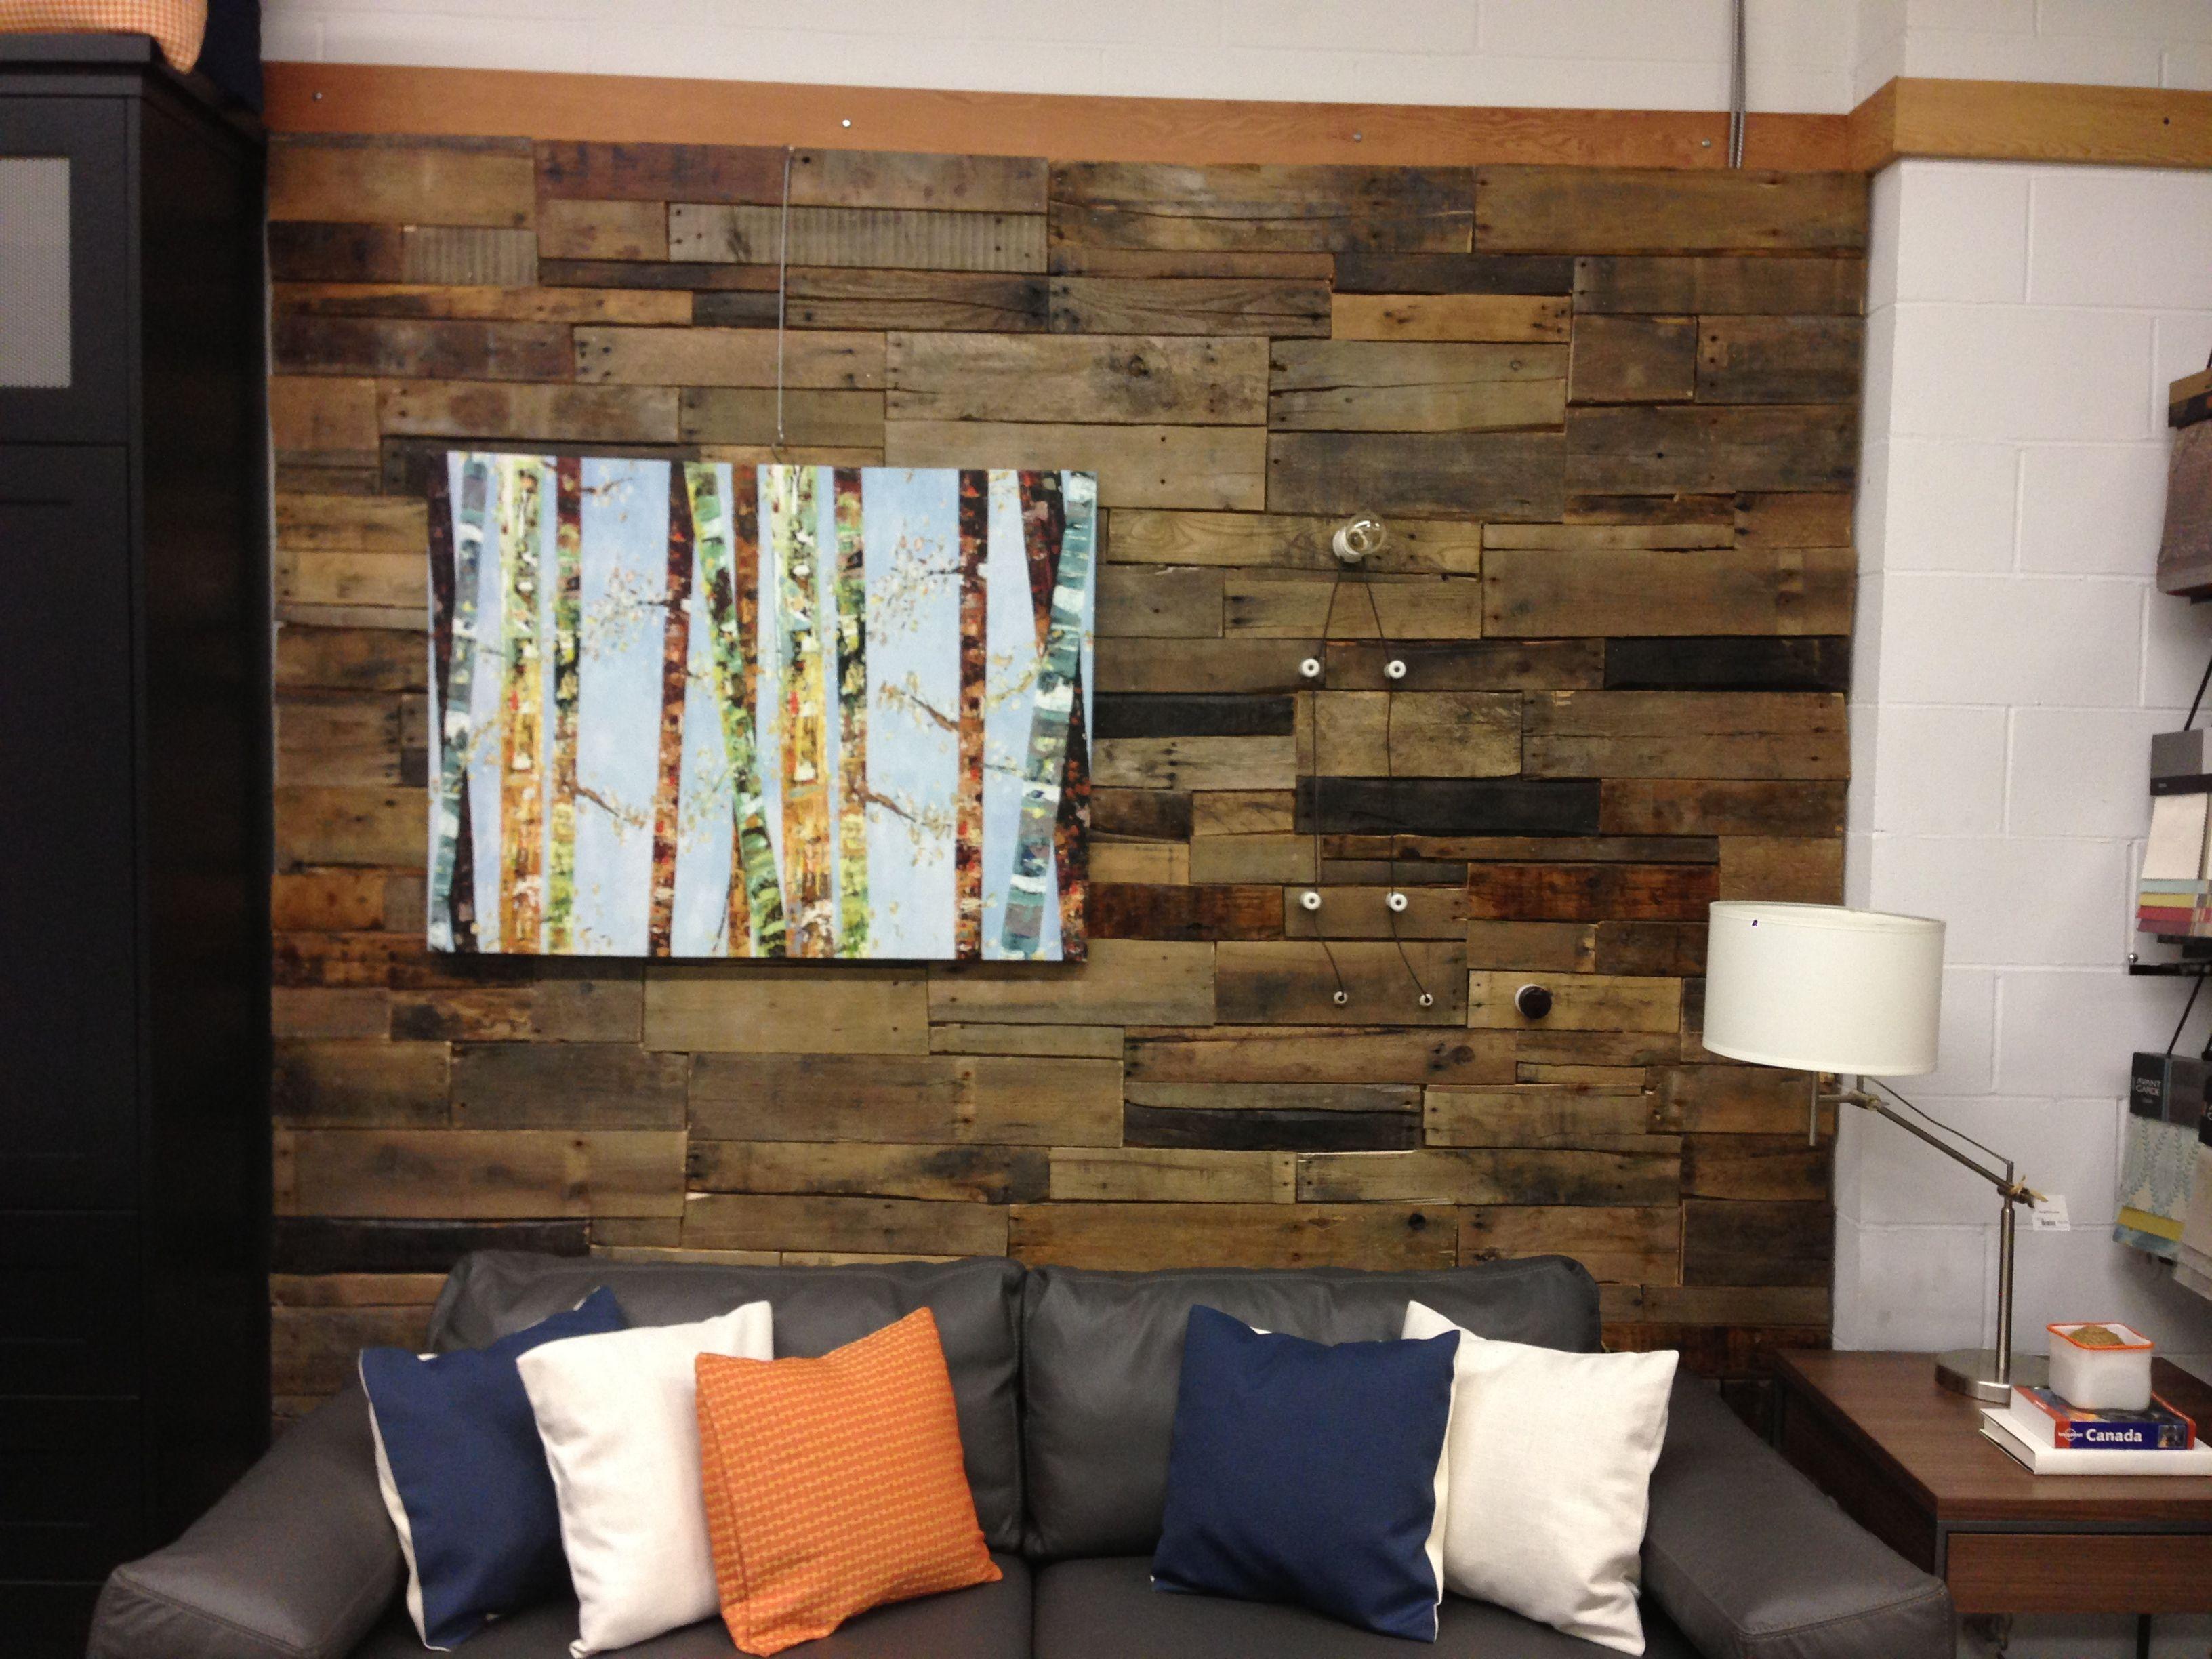 used pallet wall ideas pinterest. Black Bedroom Furniture Sets. Home Design Ideas